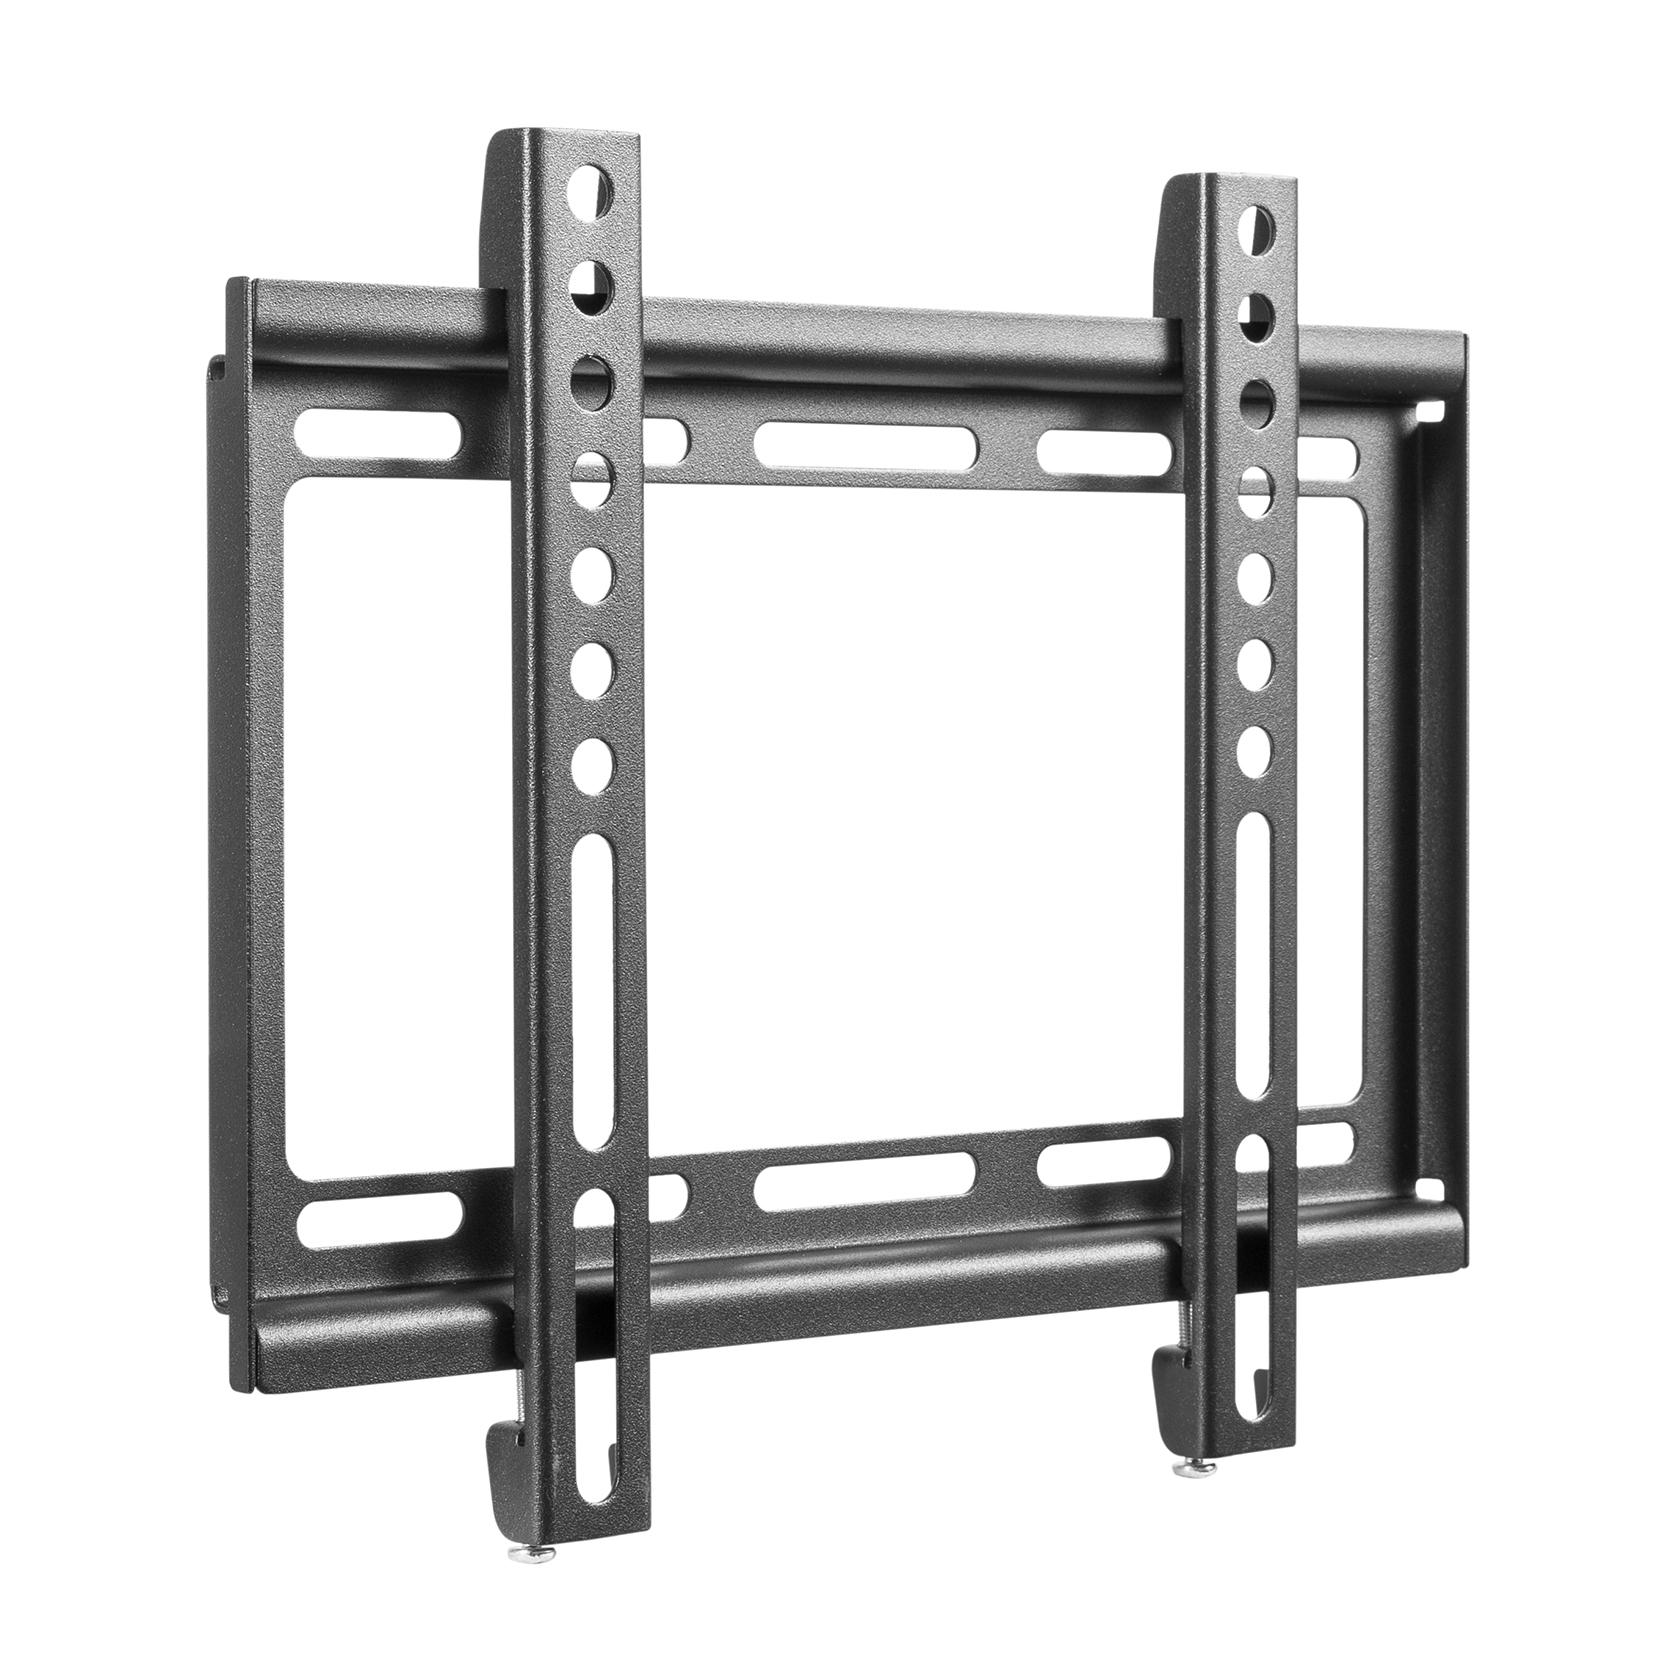 Кронштейн для телевизора Ridicon F800 Black фото